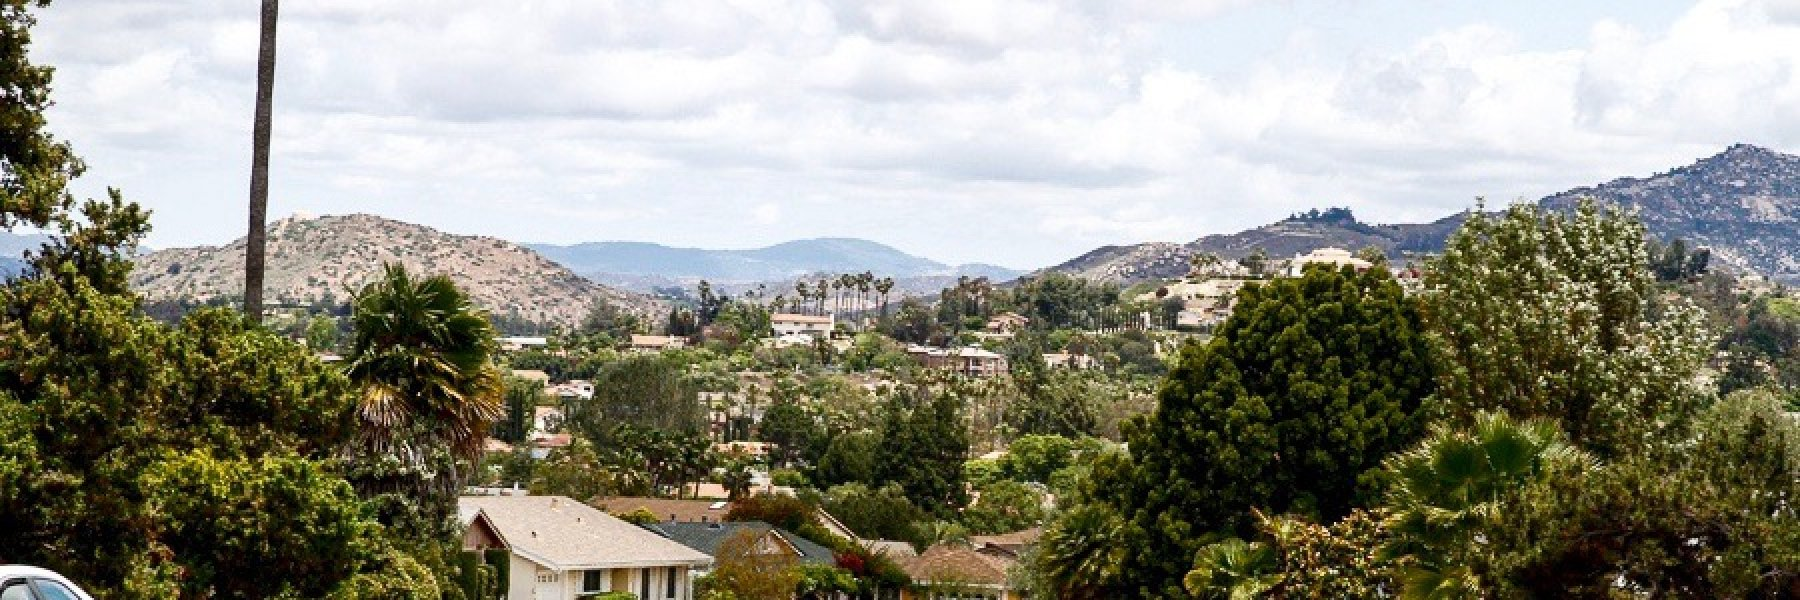 Seven Oaks is a community of homes in Rancho Bernardo California